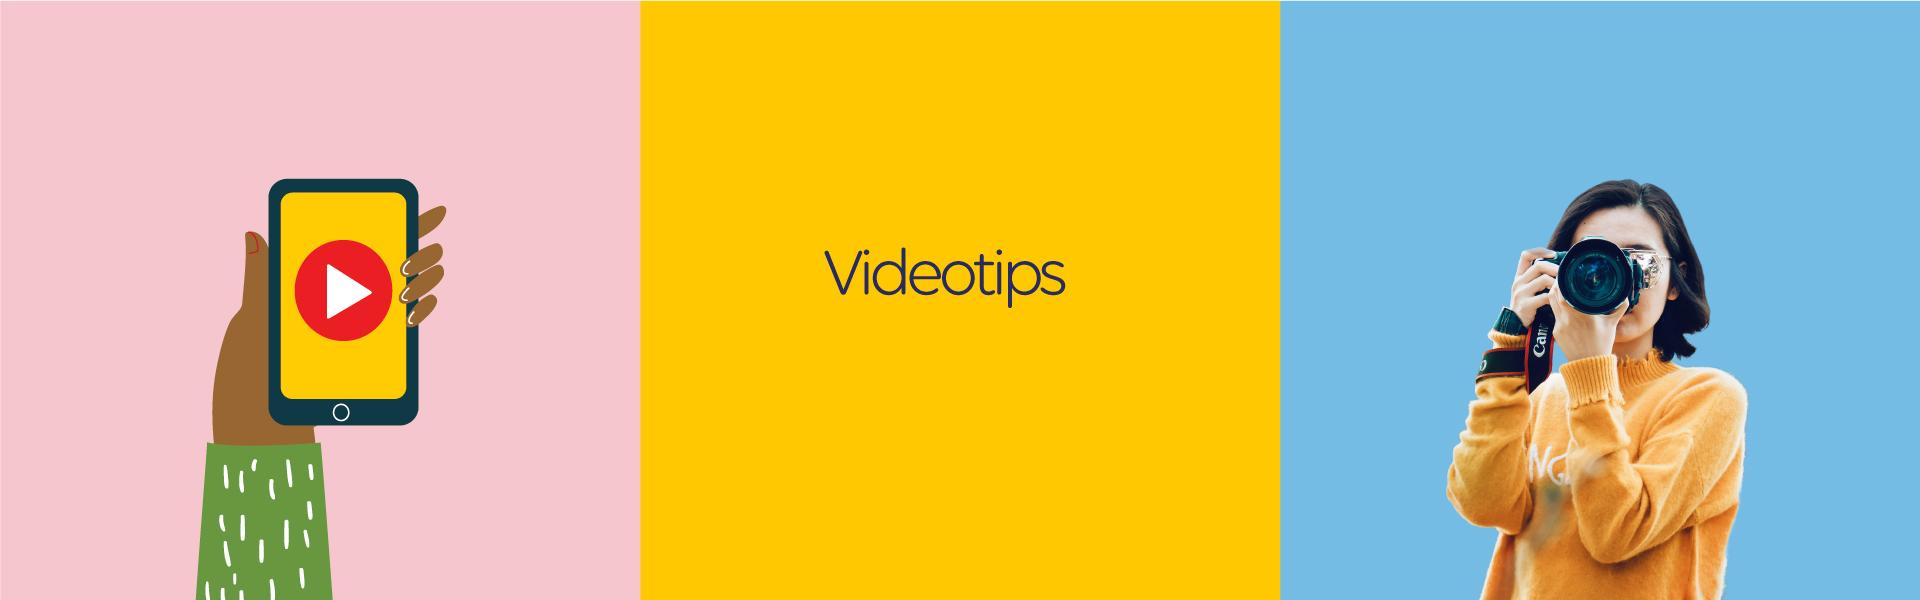 header_EPNC_videotips